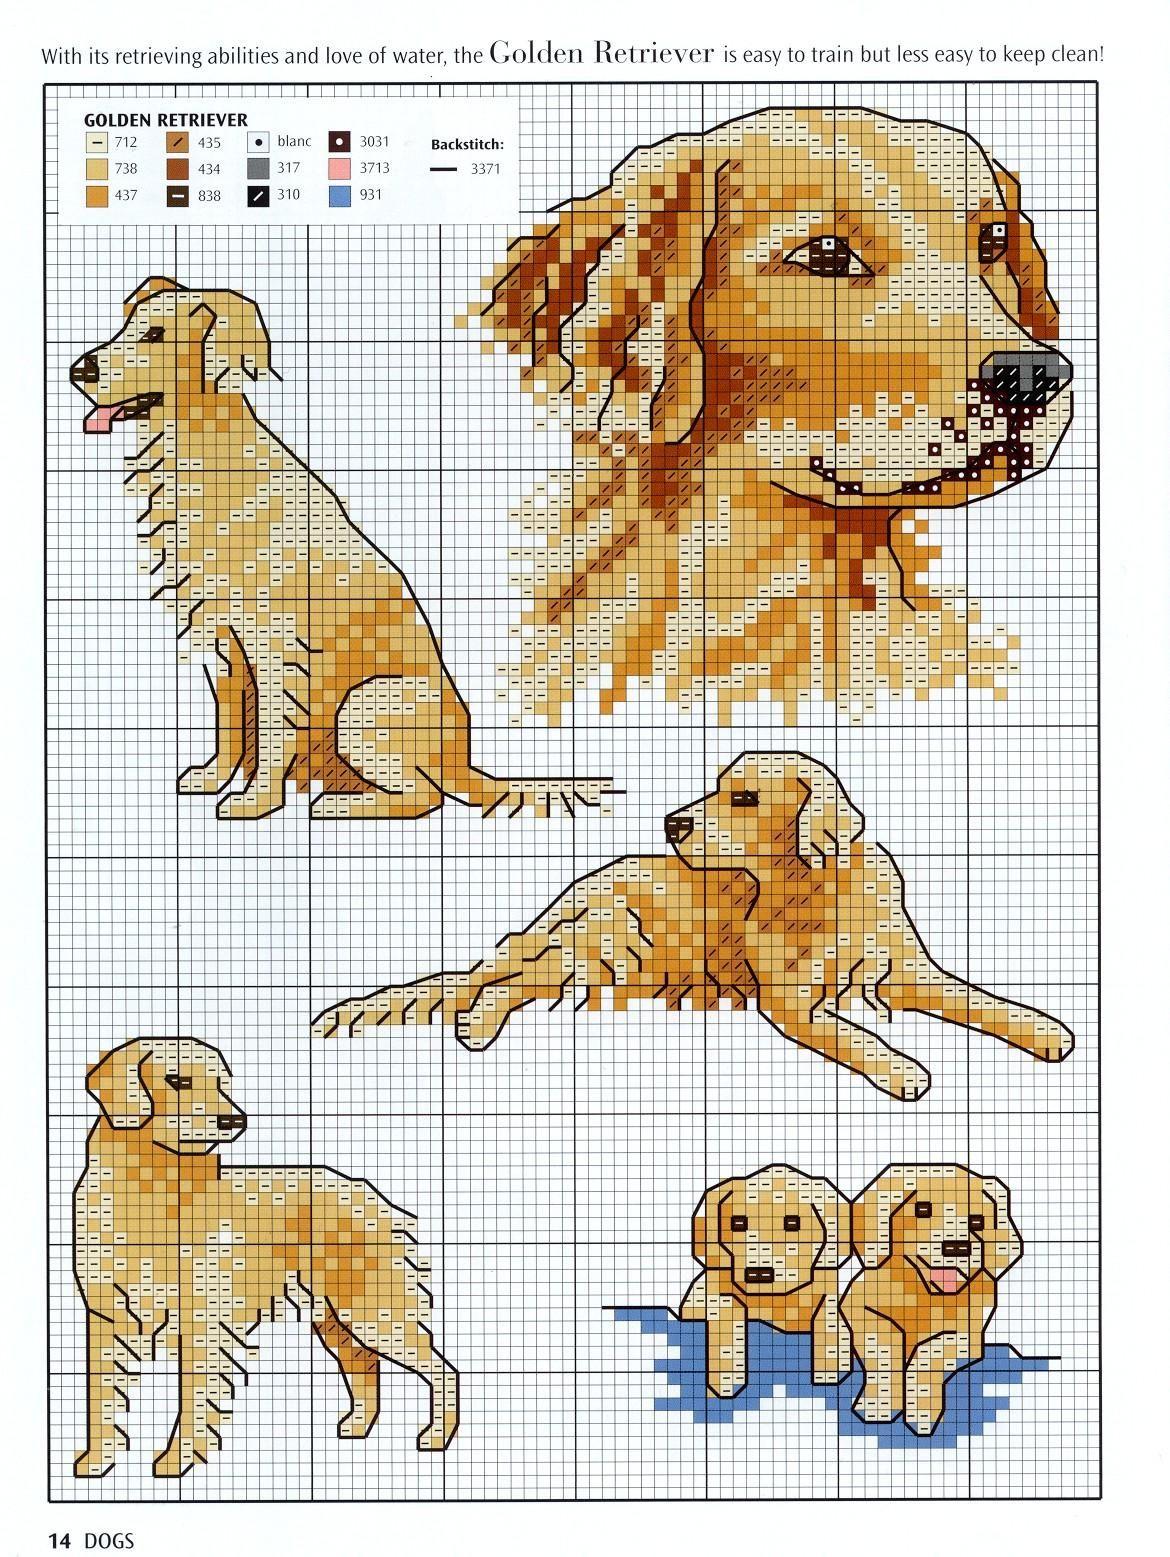 Cross stitch pattern of a dog - a symbol of 2018 66